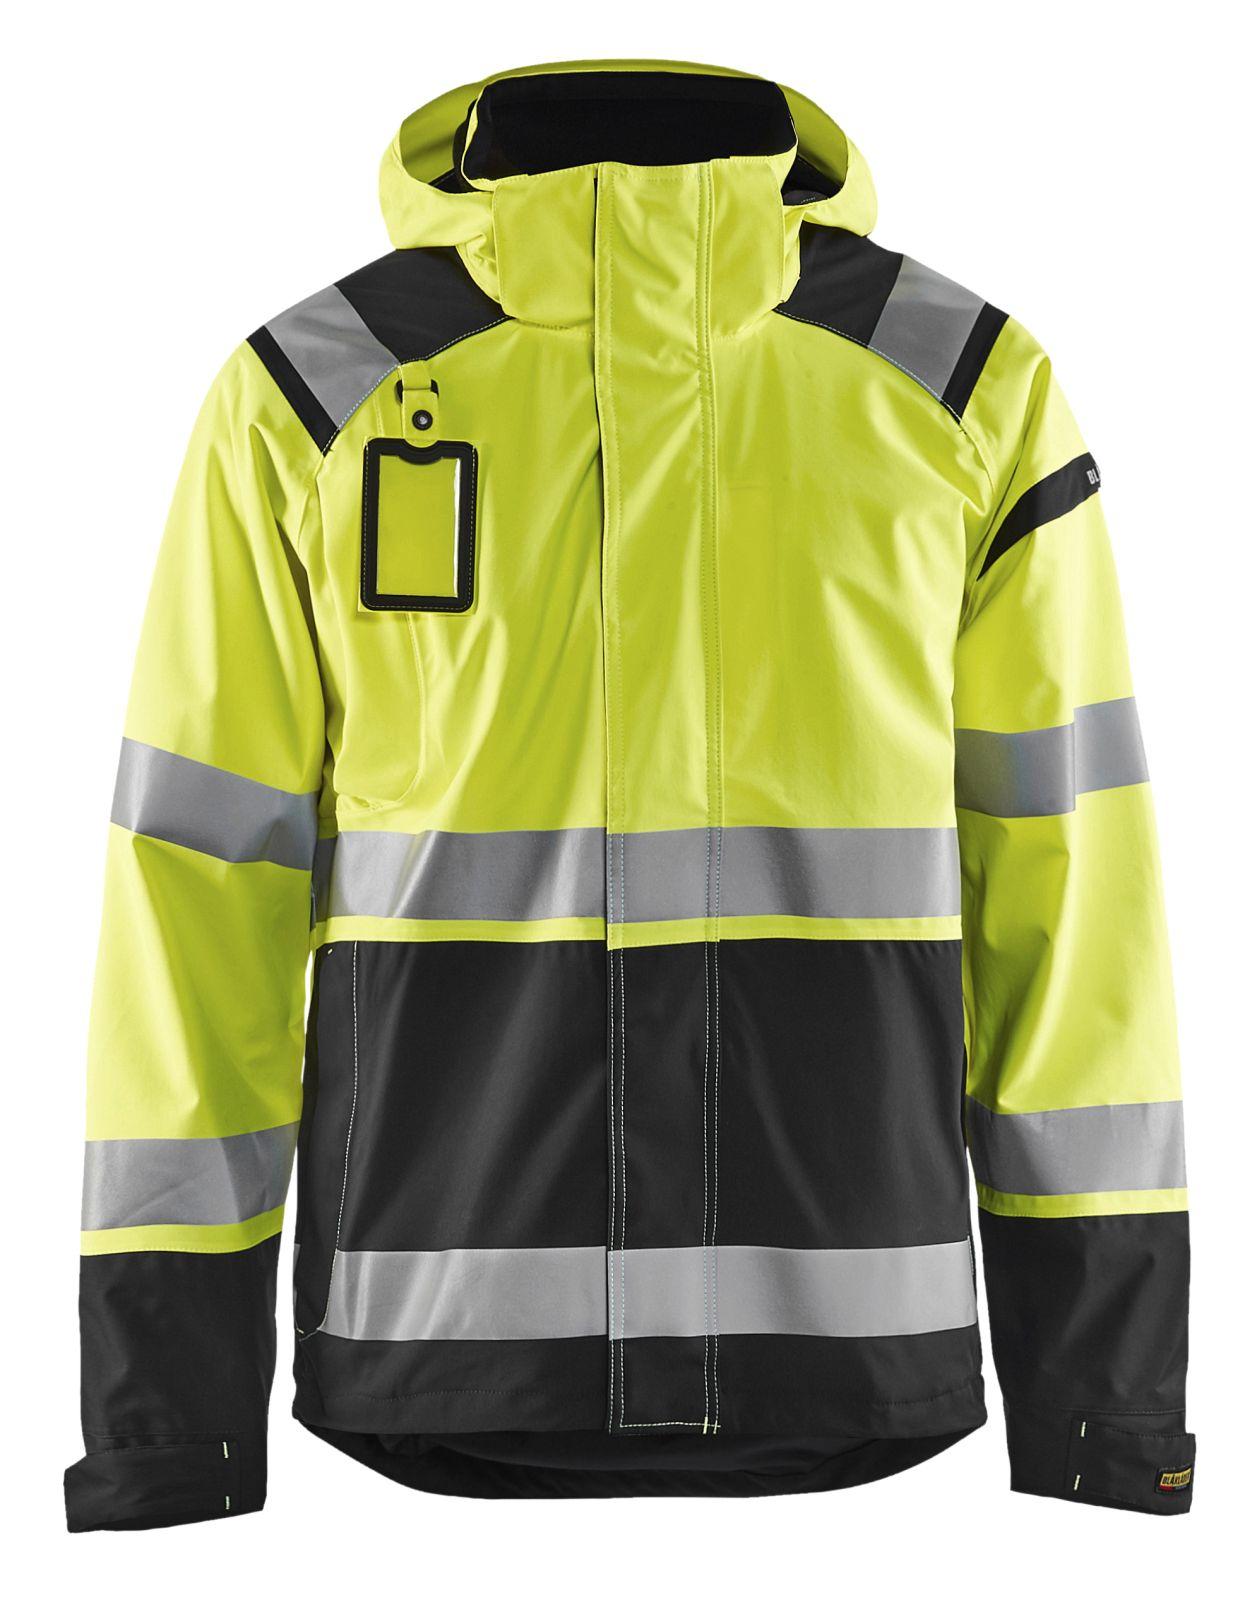 Blaklader Regenjacks 49871987 High Vis geel-zwart(3399)